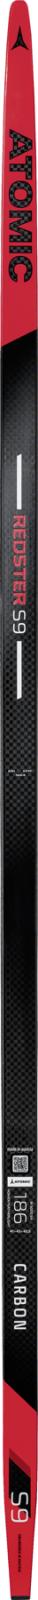 Atomic Redster S9 Carbon Universal Soft/Medium